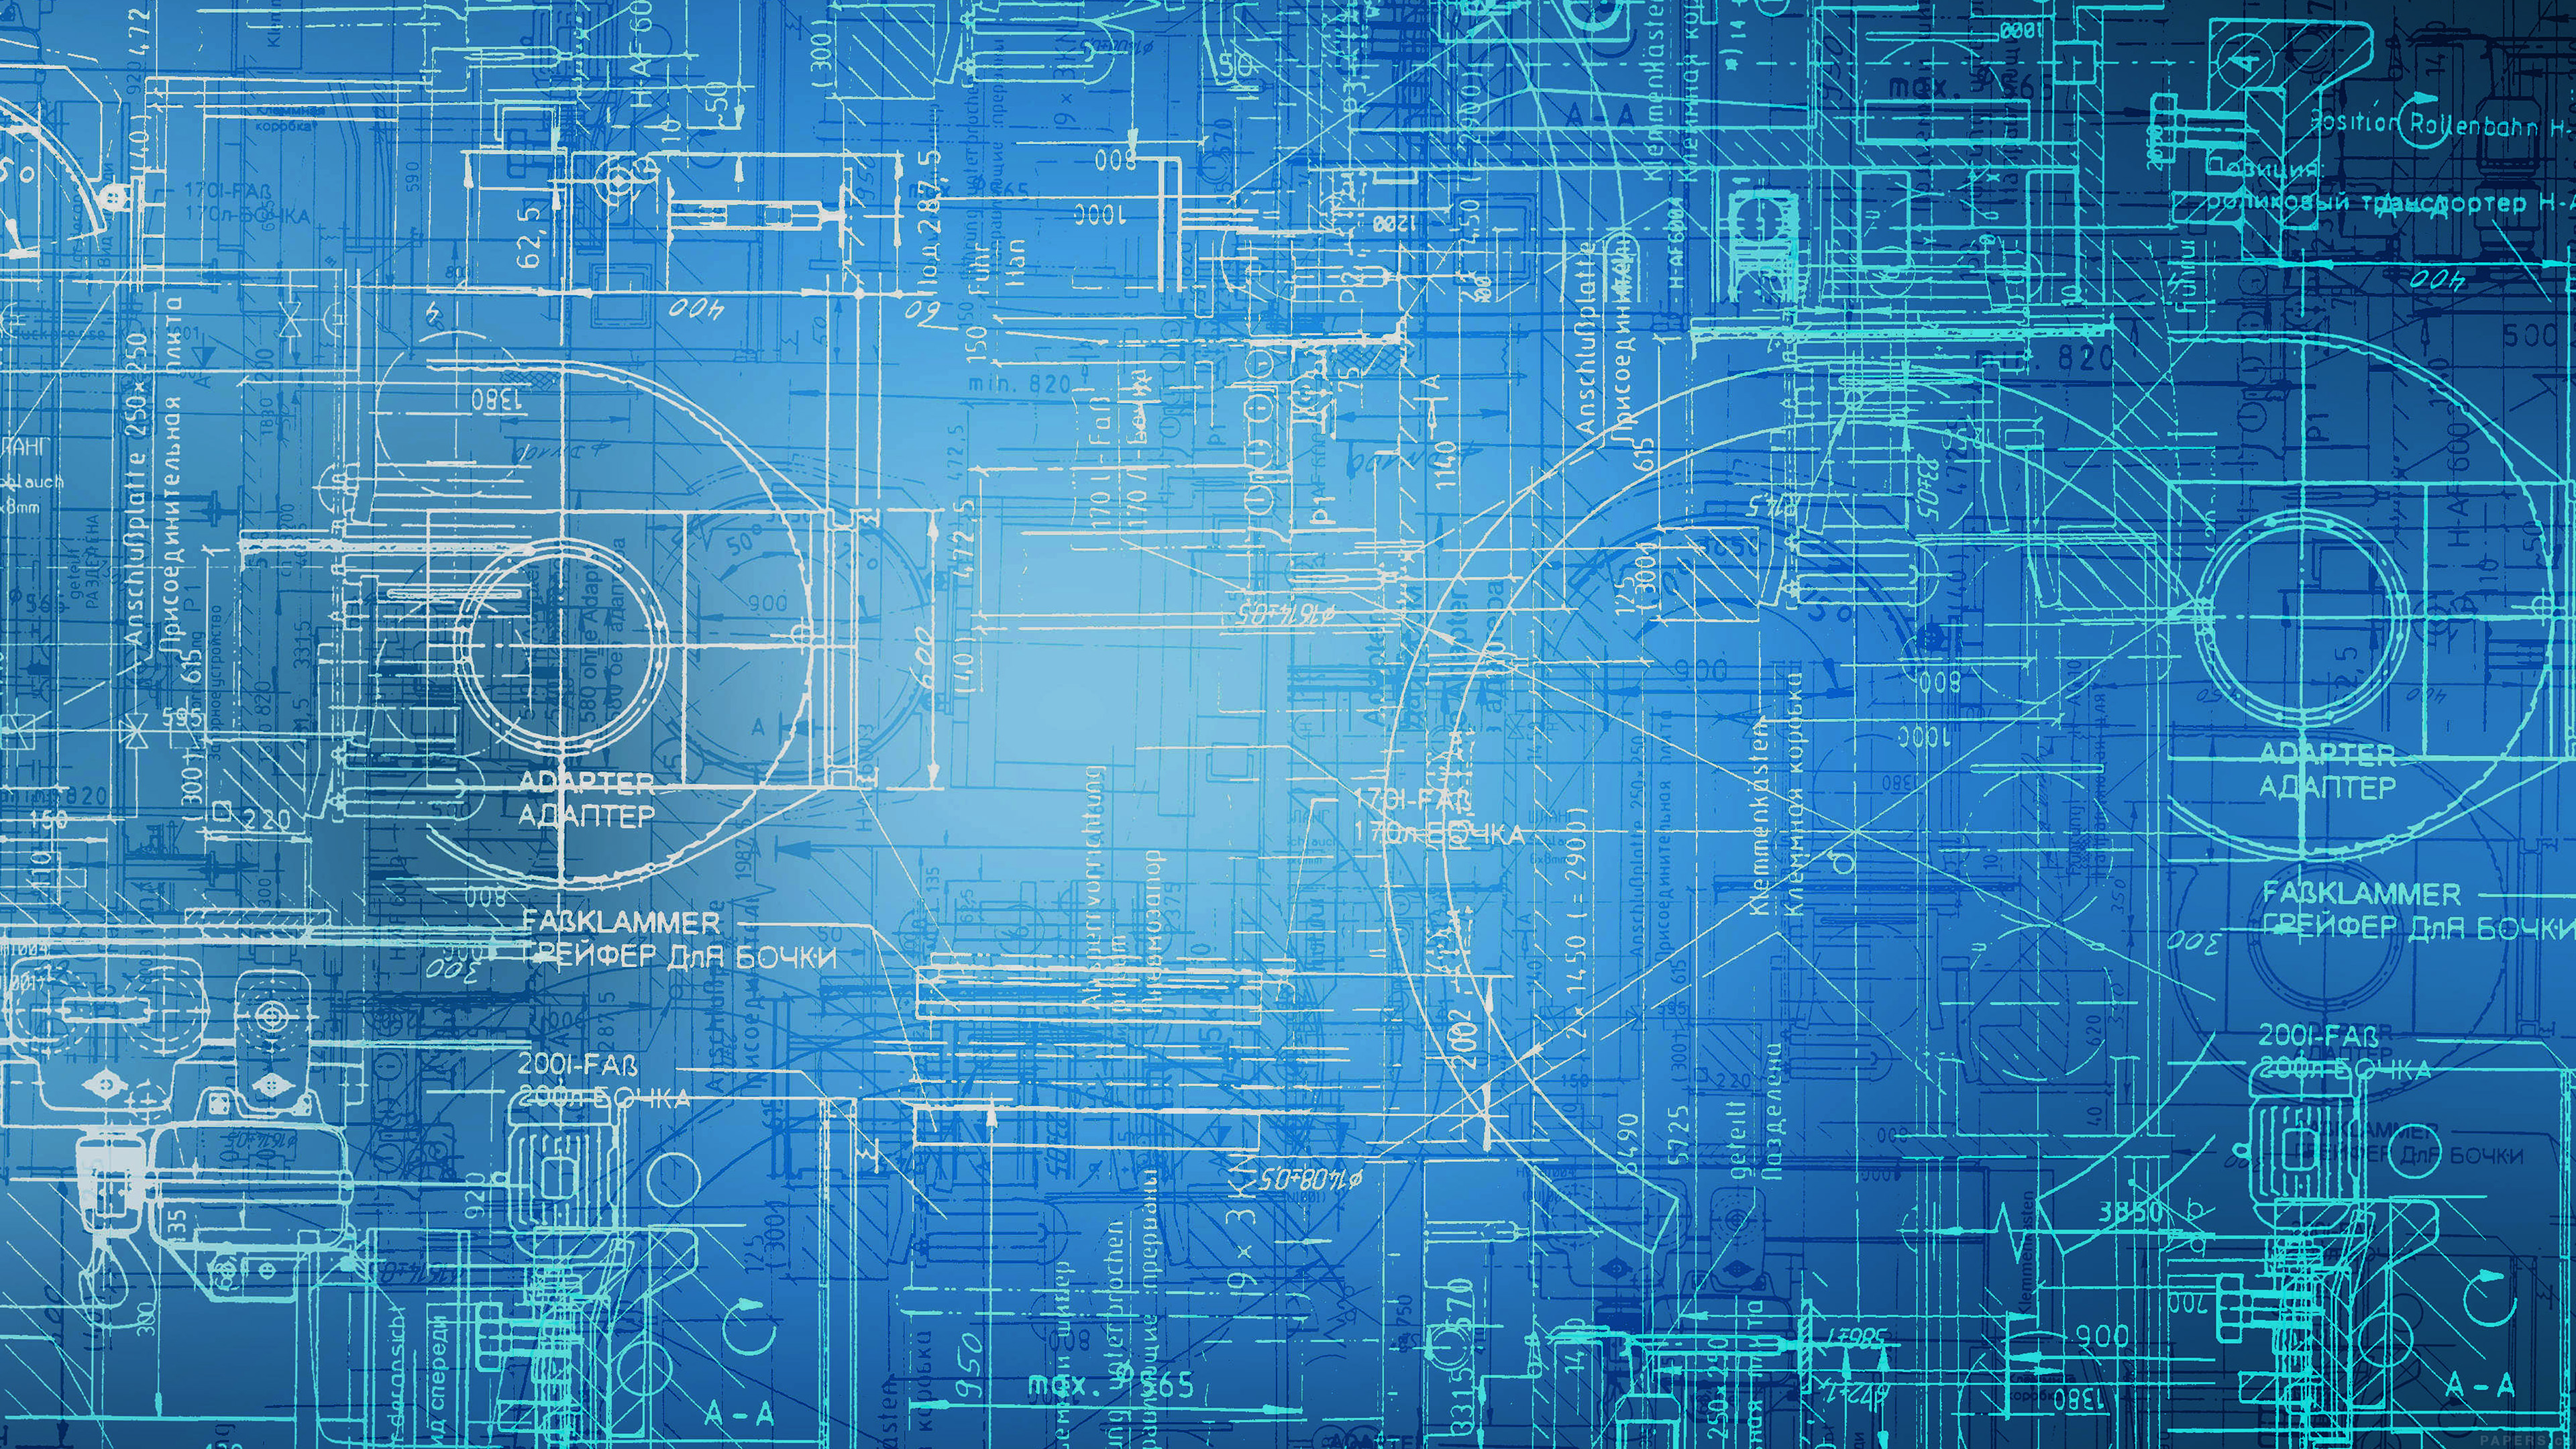 Red White And Blue Car Wallpaper Iphone Wallpaper For Desktop Laptop Vi77 Brainstorming